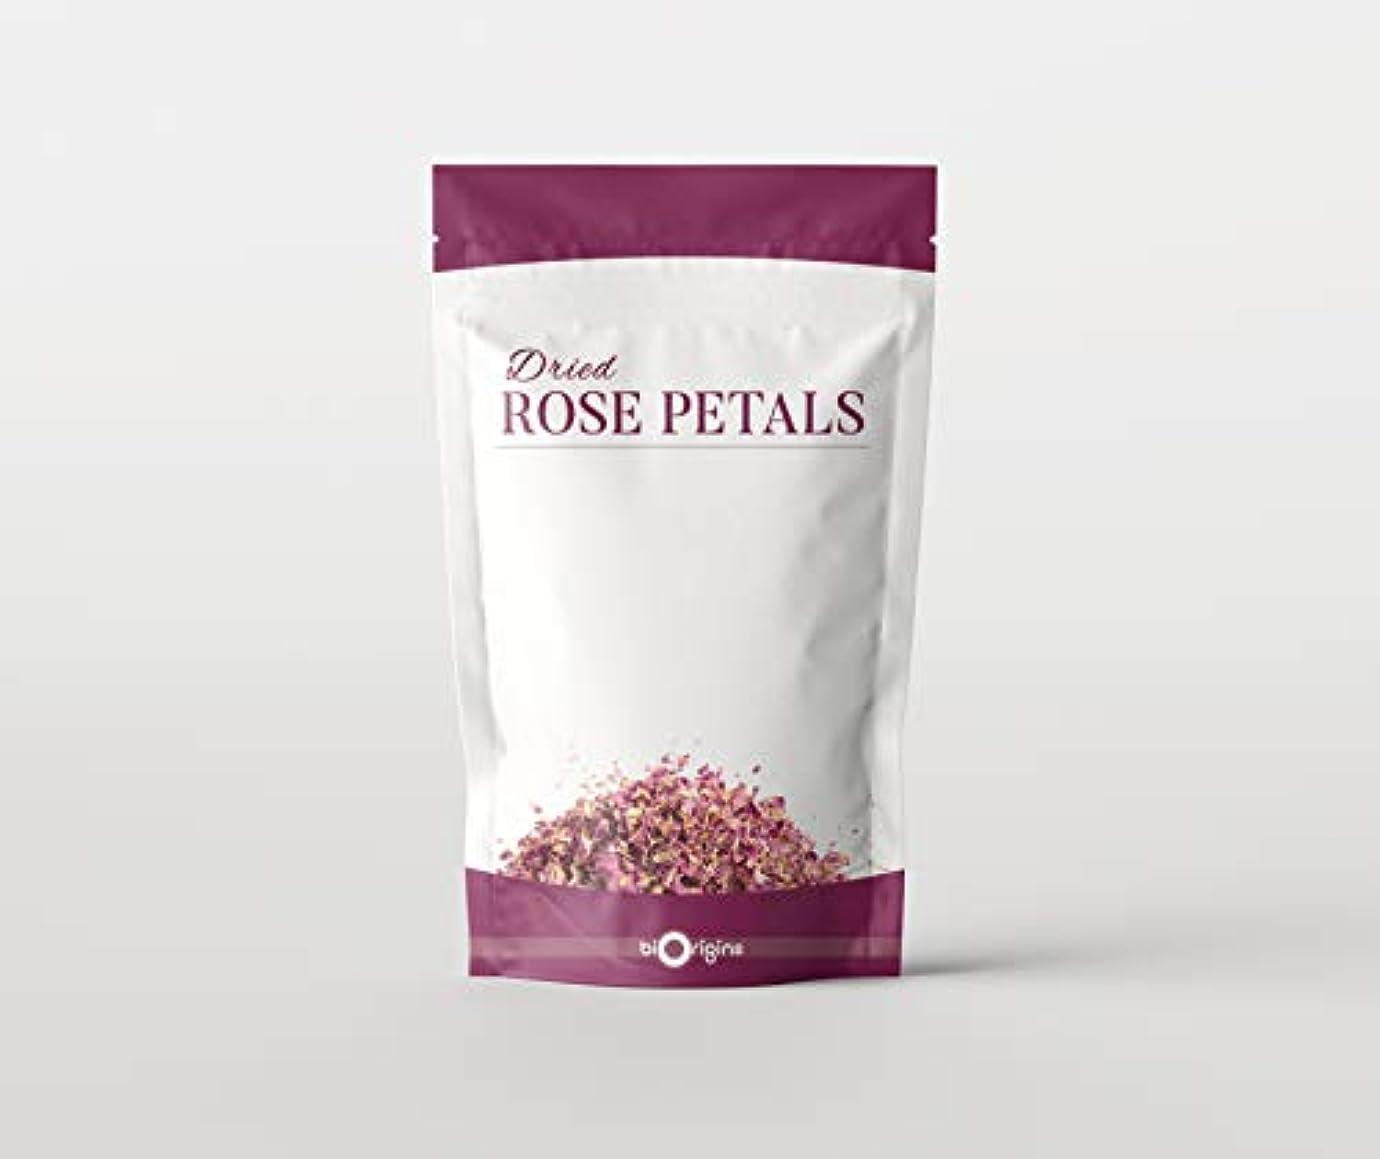 Dried Rose Petals - 100g